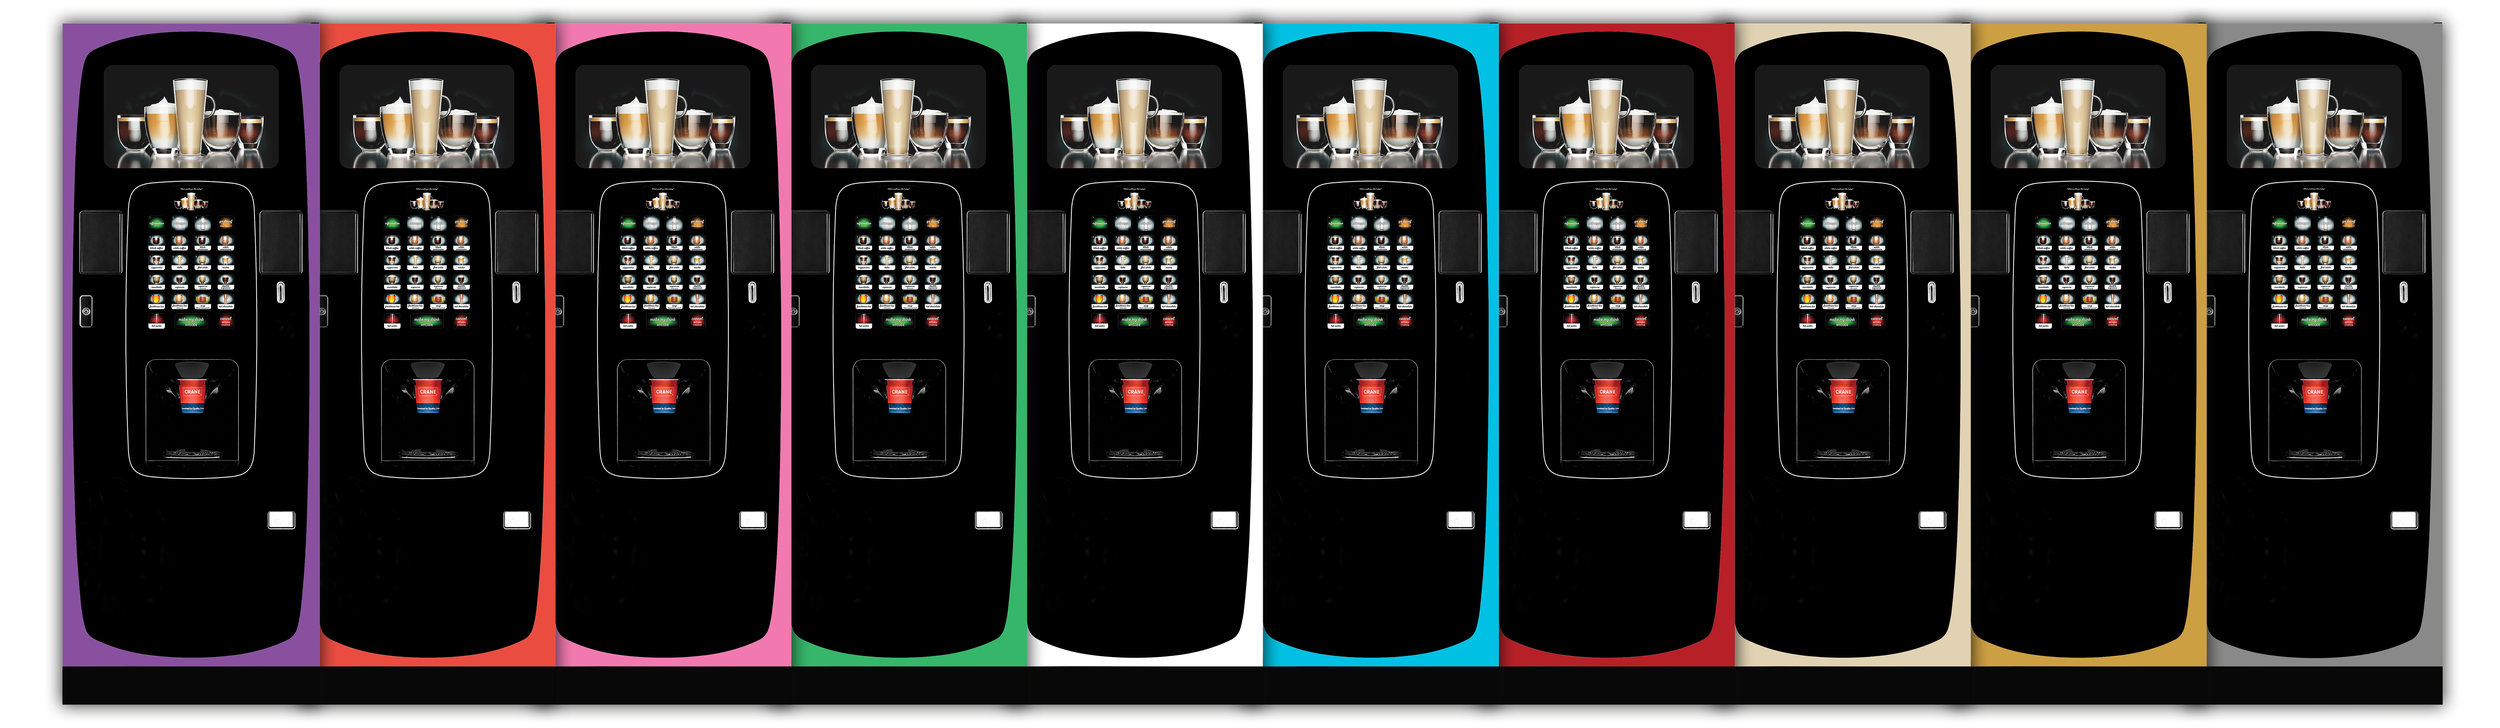 Power of Colour Machines Image Hi-Res.jpg